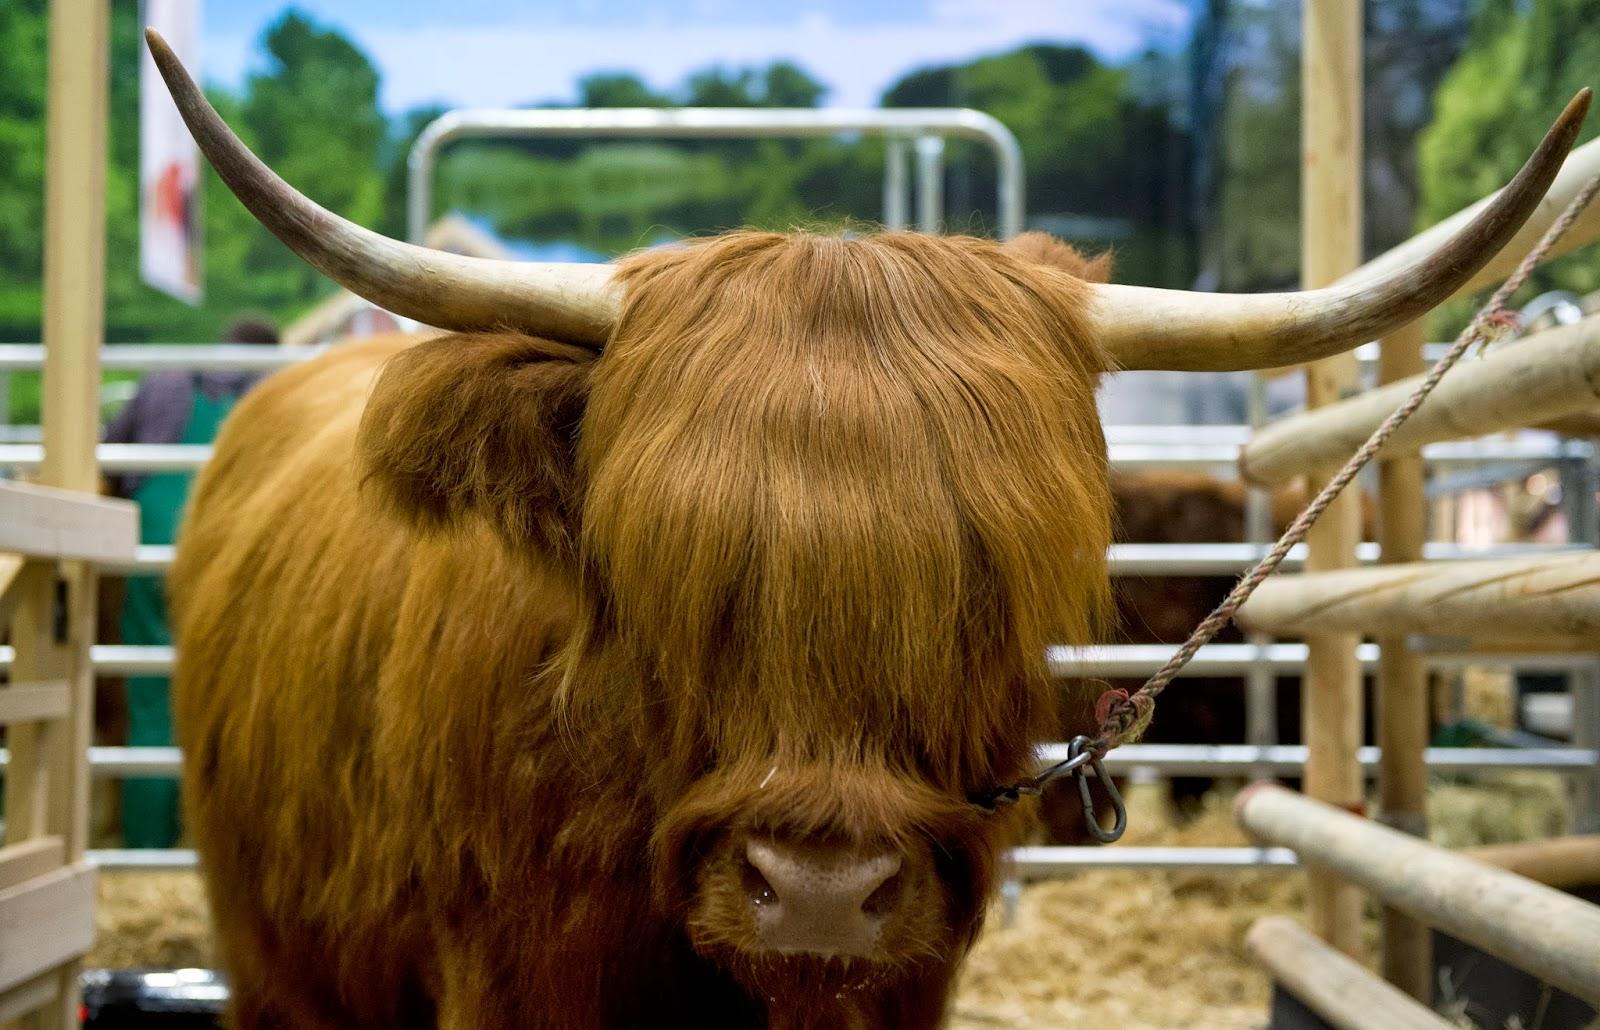 International, Green Week, Berlin, Agriculture Fair, 2014, Animals, Hall, Cow, Contest, Show, Gruene Woche, Green Week, Woman, Stall, Mecklenburg-Vorpommern, Fleckvieh, Farm, Enclosure, Business, Economy, Agriculture,